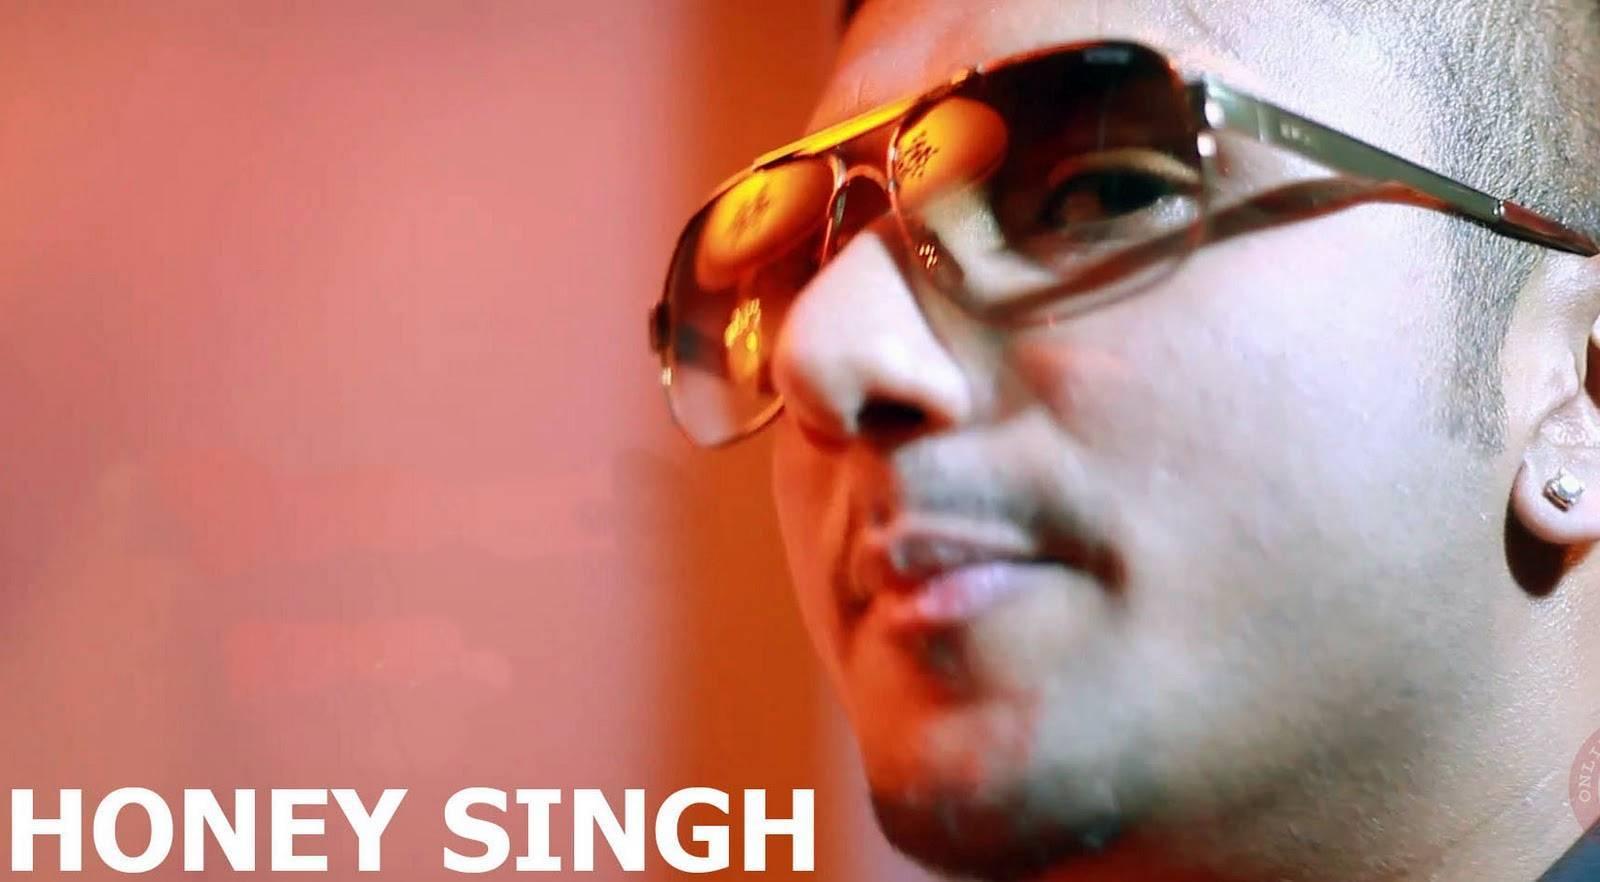 http://2.bp.blogspot.com/-BASdSTqSoXw/USJdAcoUPuI/AAAAAAAAE2E/w4eqxEnHGzA/s1600/Yo+Yo+Honey+Singh+3.jpg